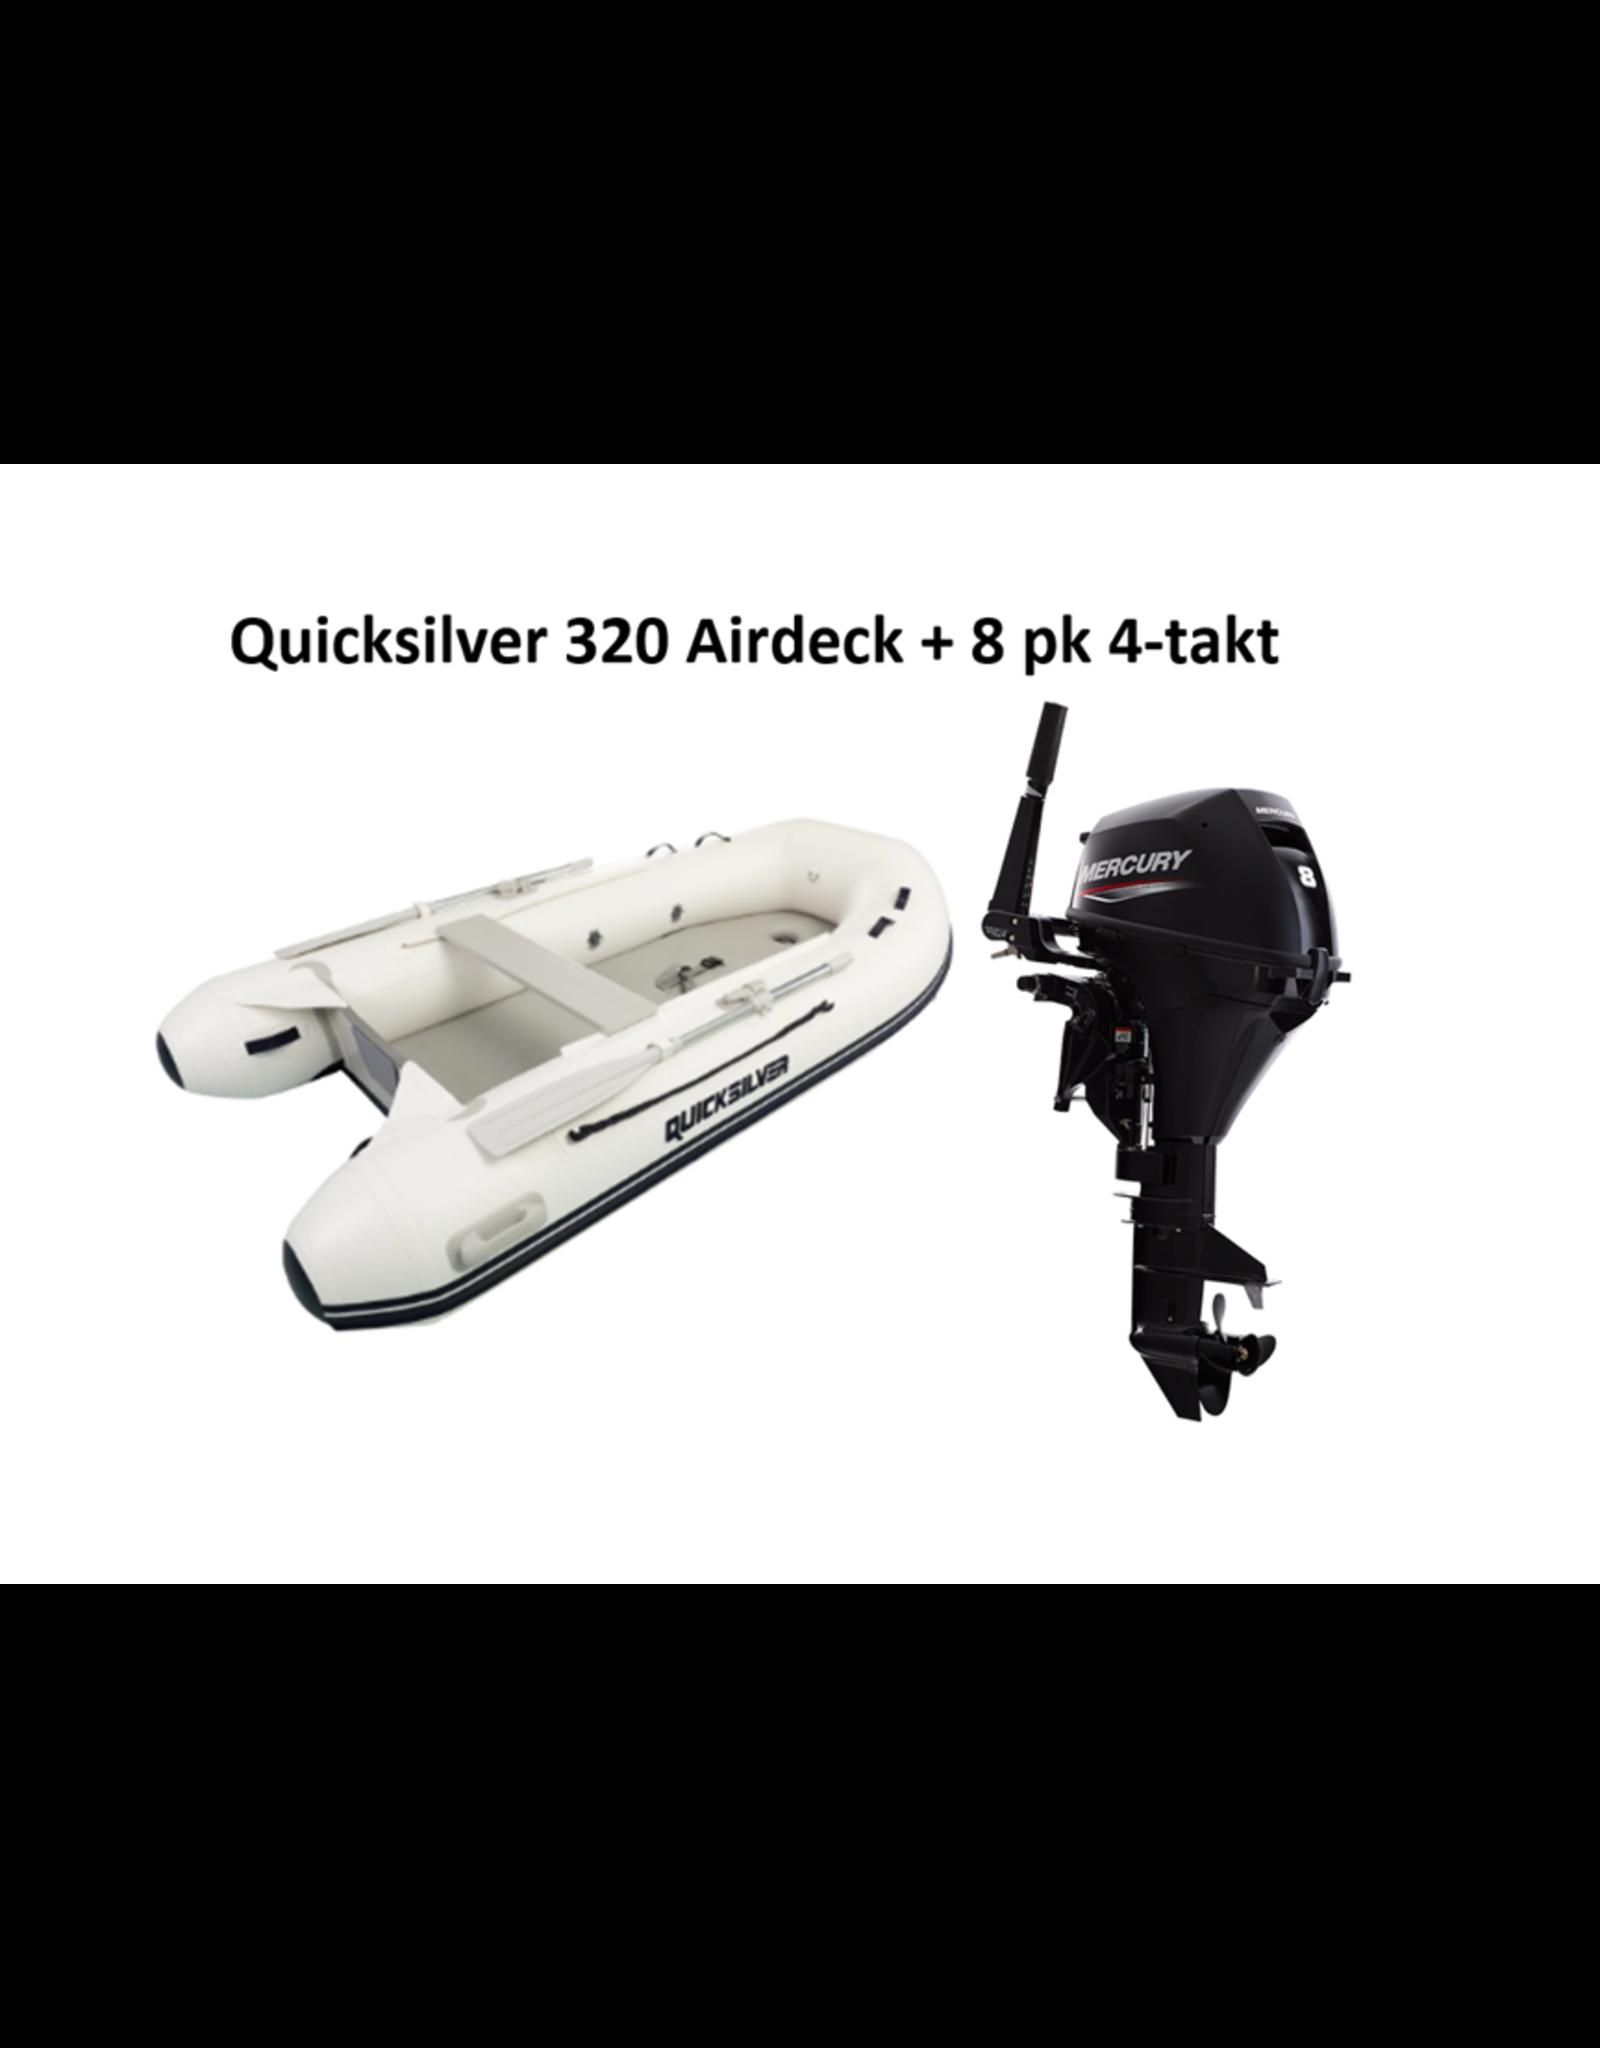 Quicksilver Quicksilver 320  Airdeck + Mercury 4/20 pk 4-takt